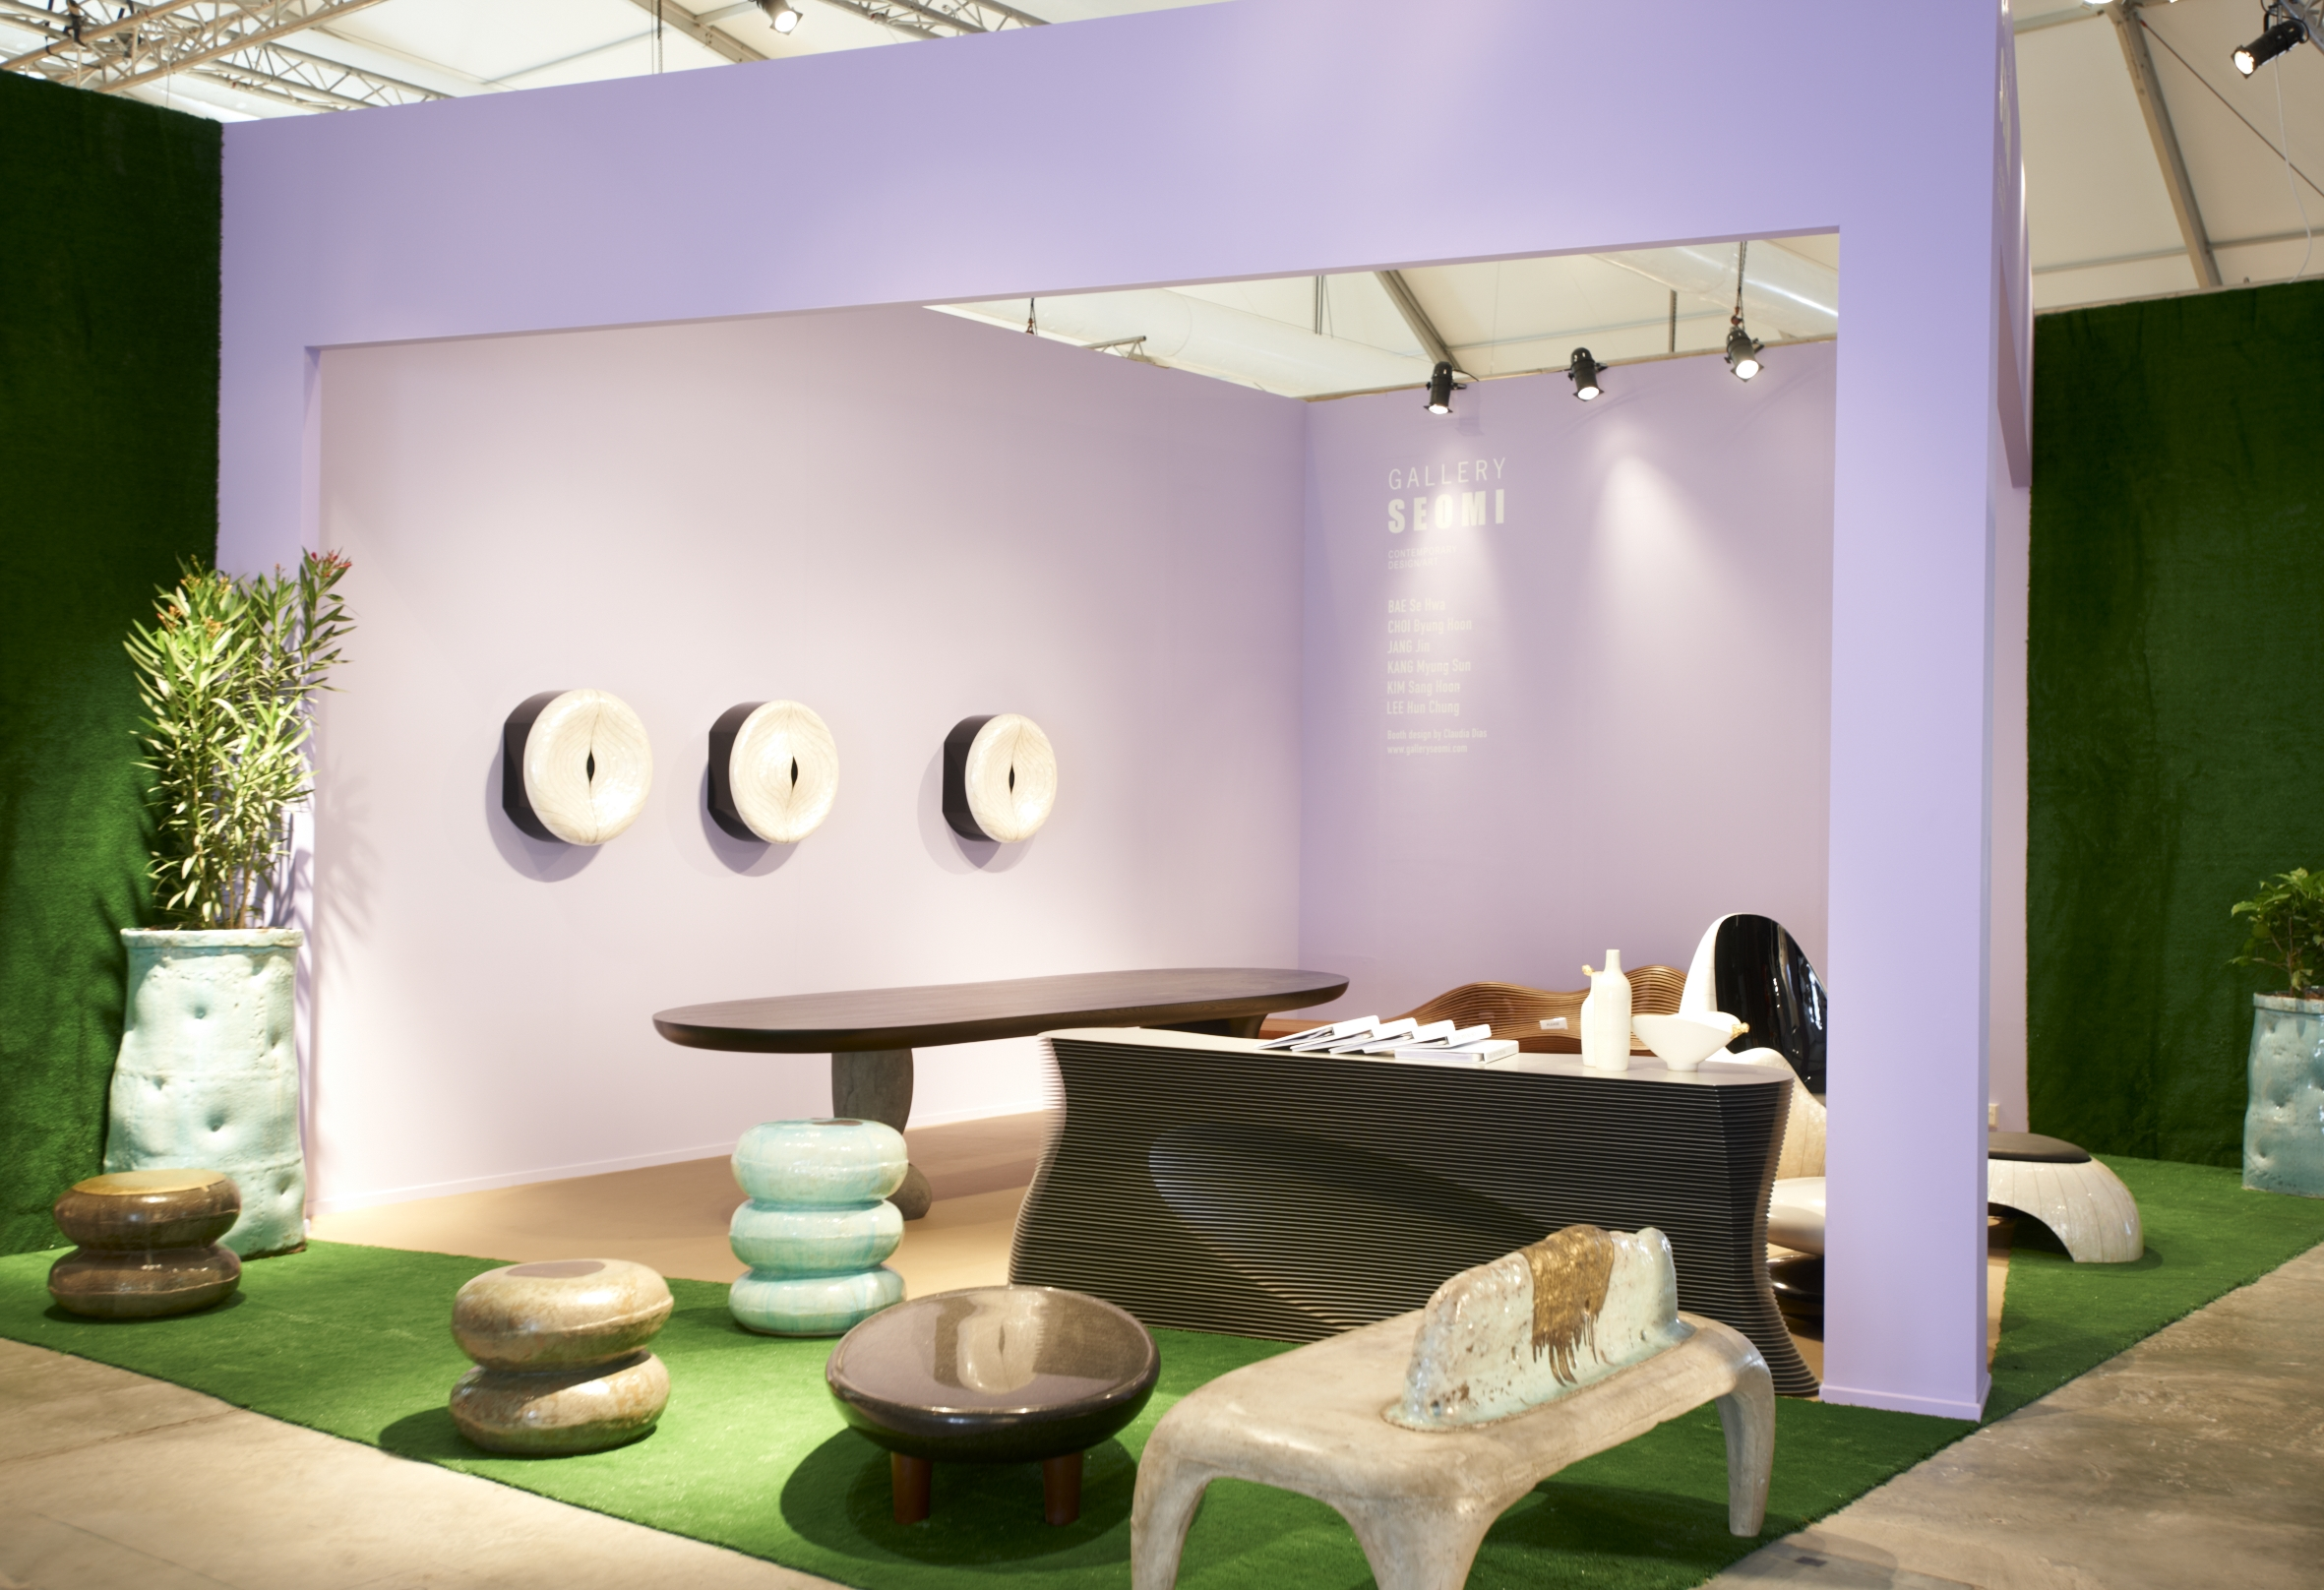 Gallery Seomi